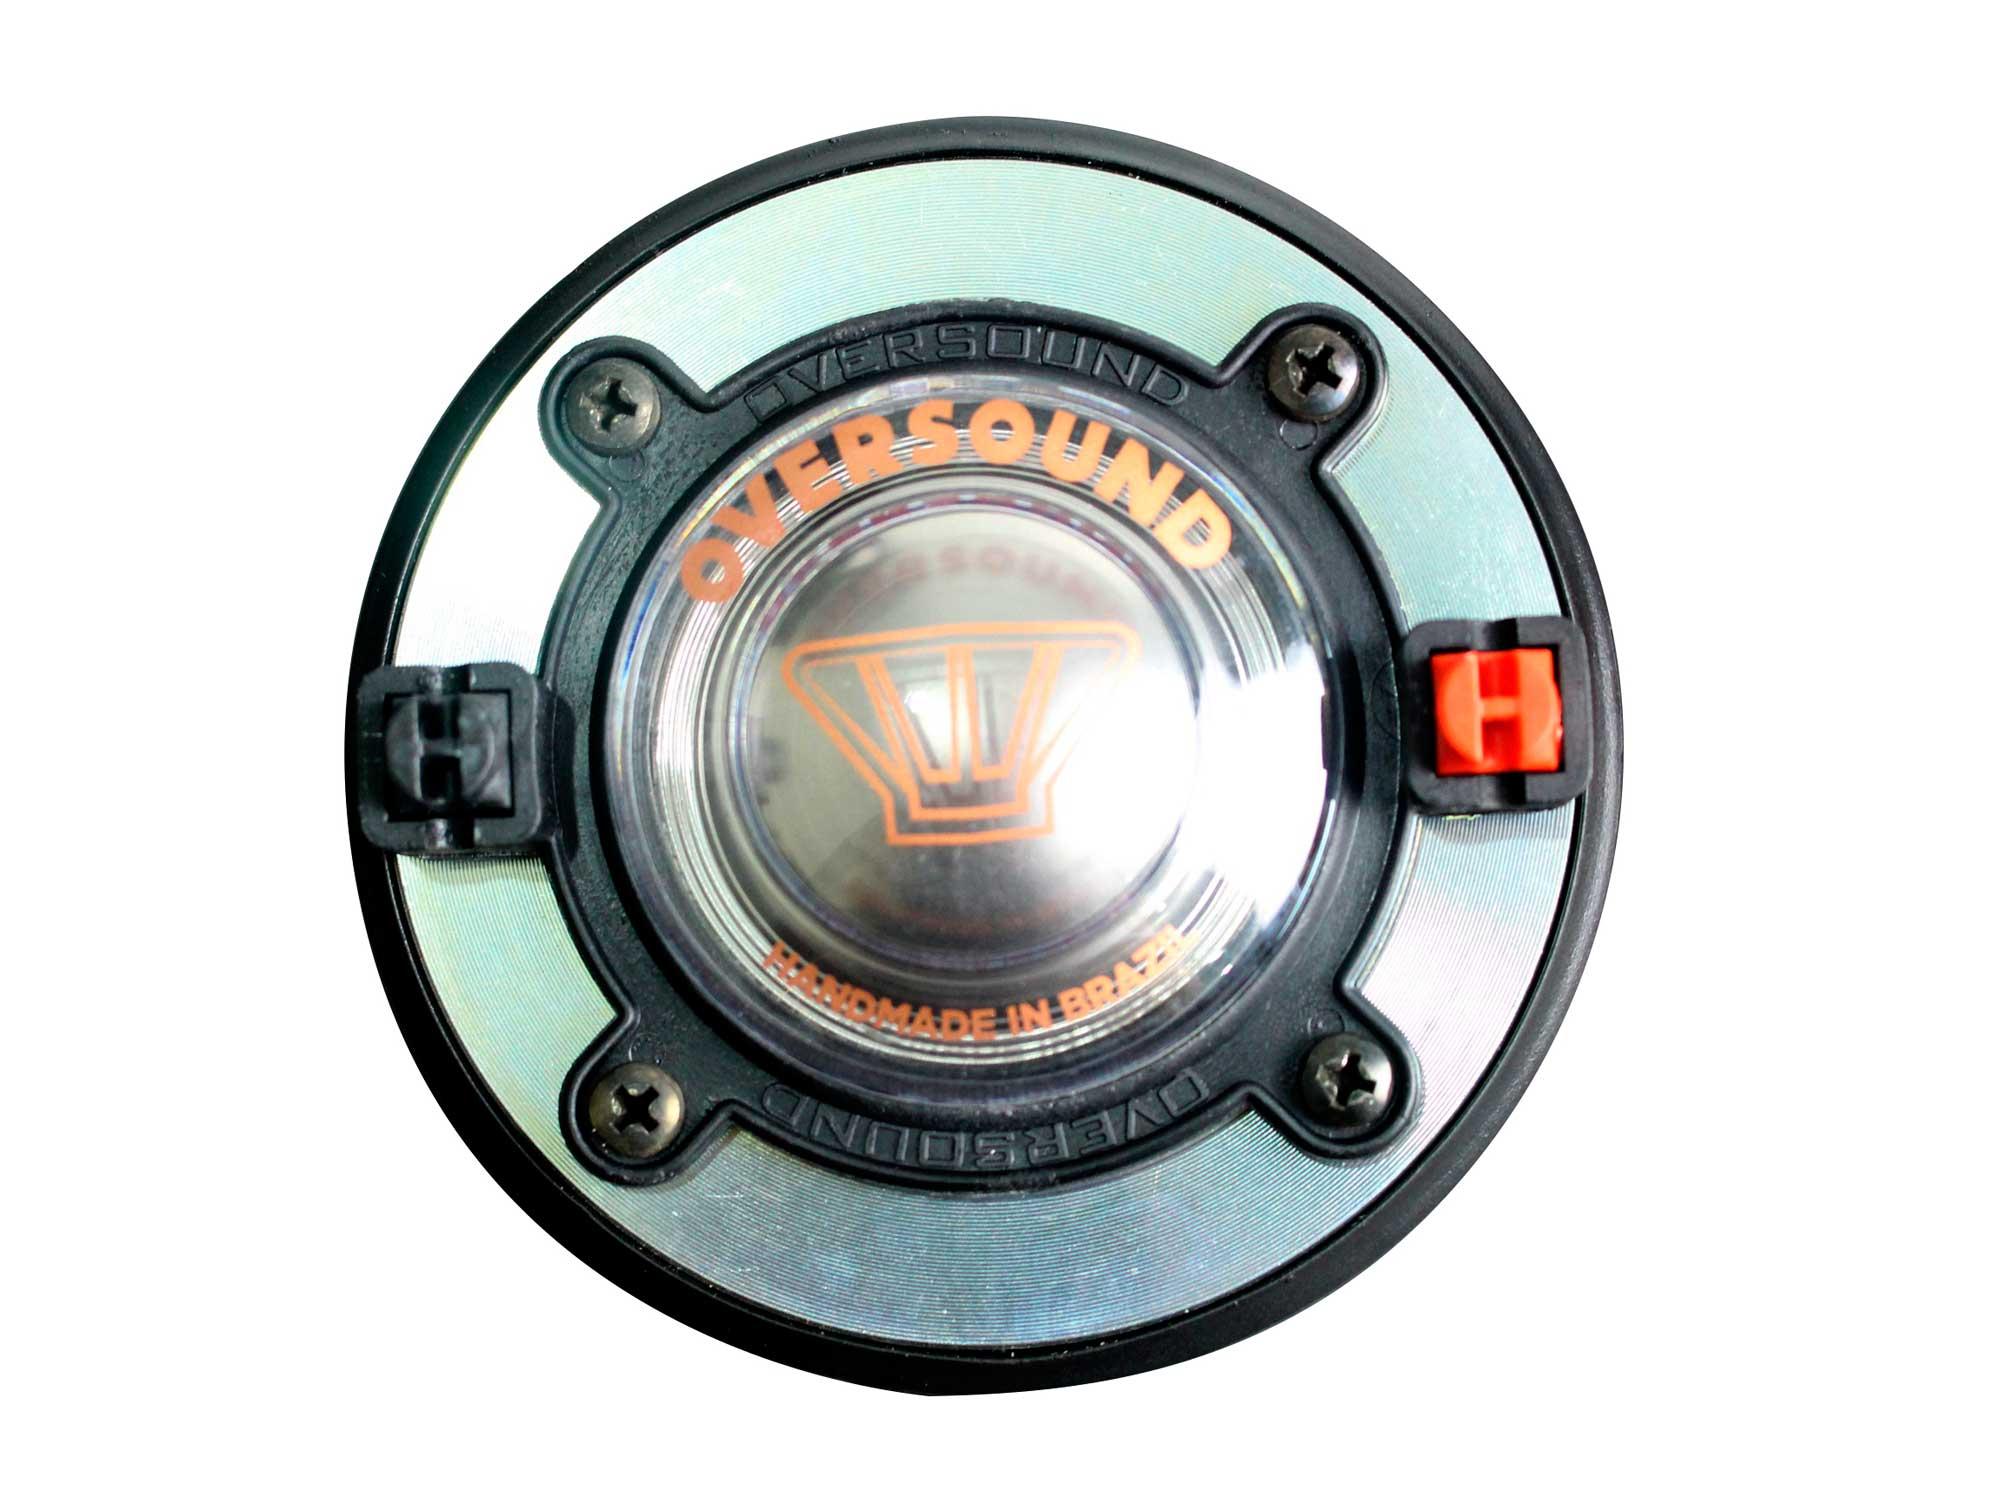 Driver Titânio de 1 polegada 90 Watts RMS Oversound DTI2560